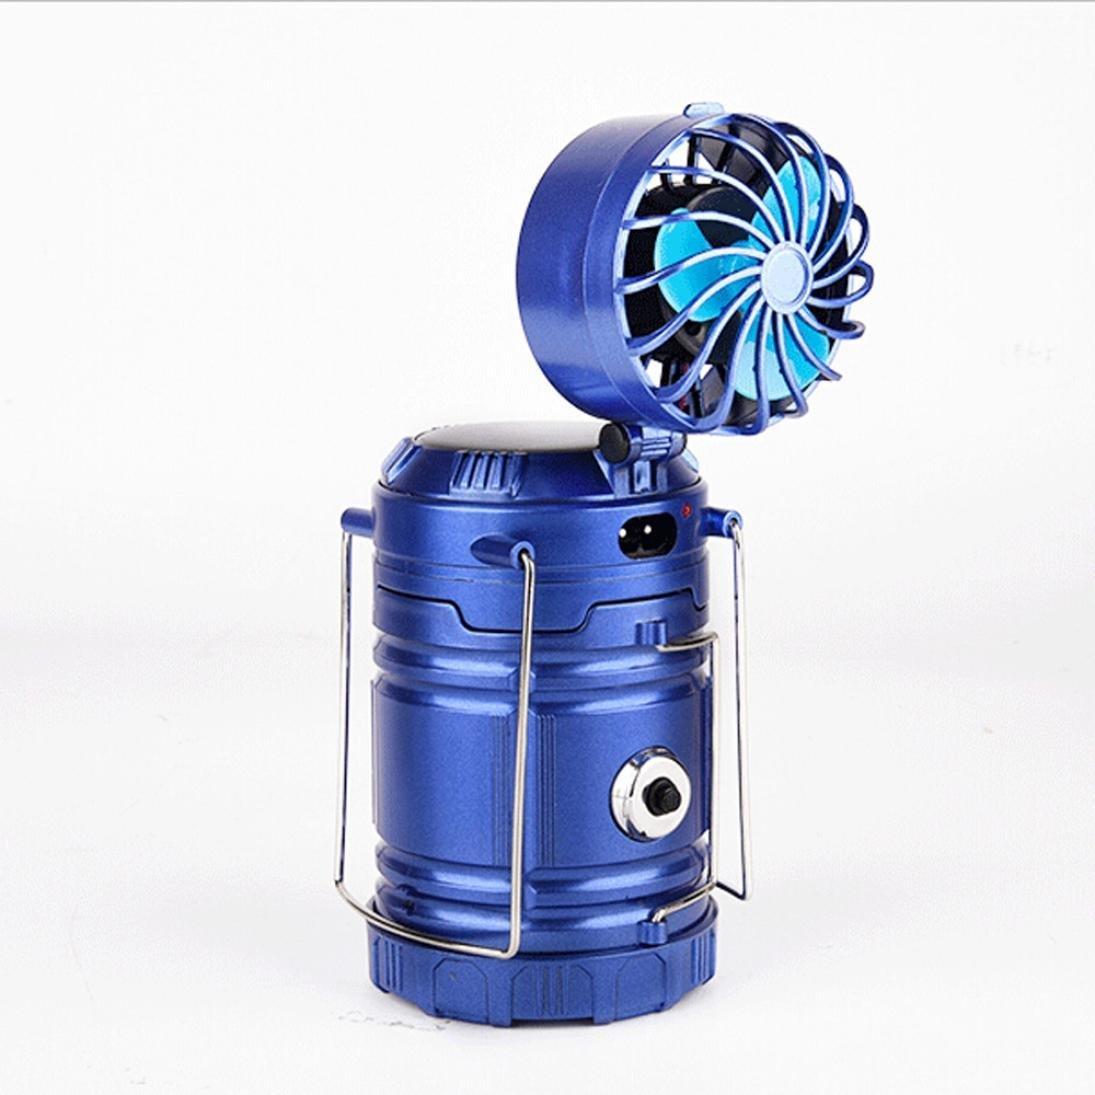 Vovomay Portable Fan Solar Lantern Outdoor Multi-function Solar Rechargeable Fan LED Camping Light Flashlight (Blue)